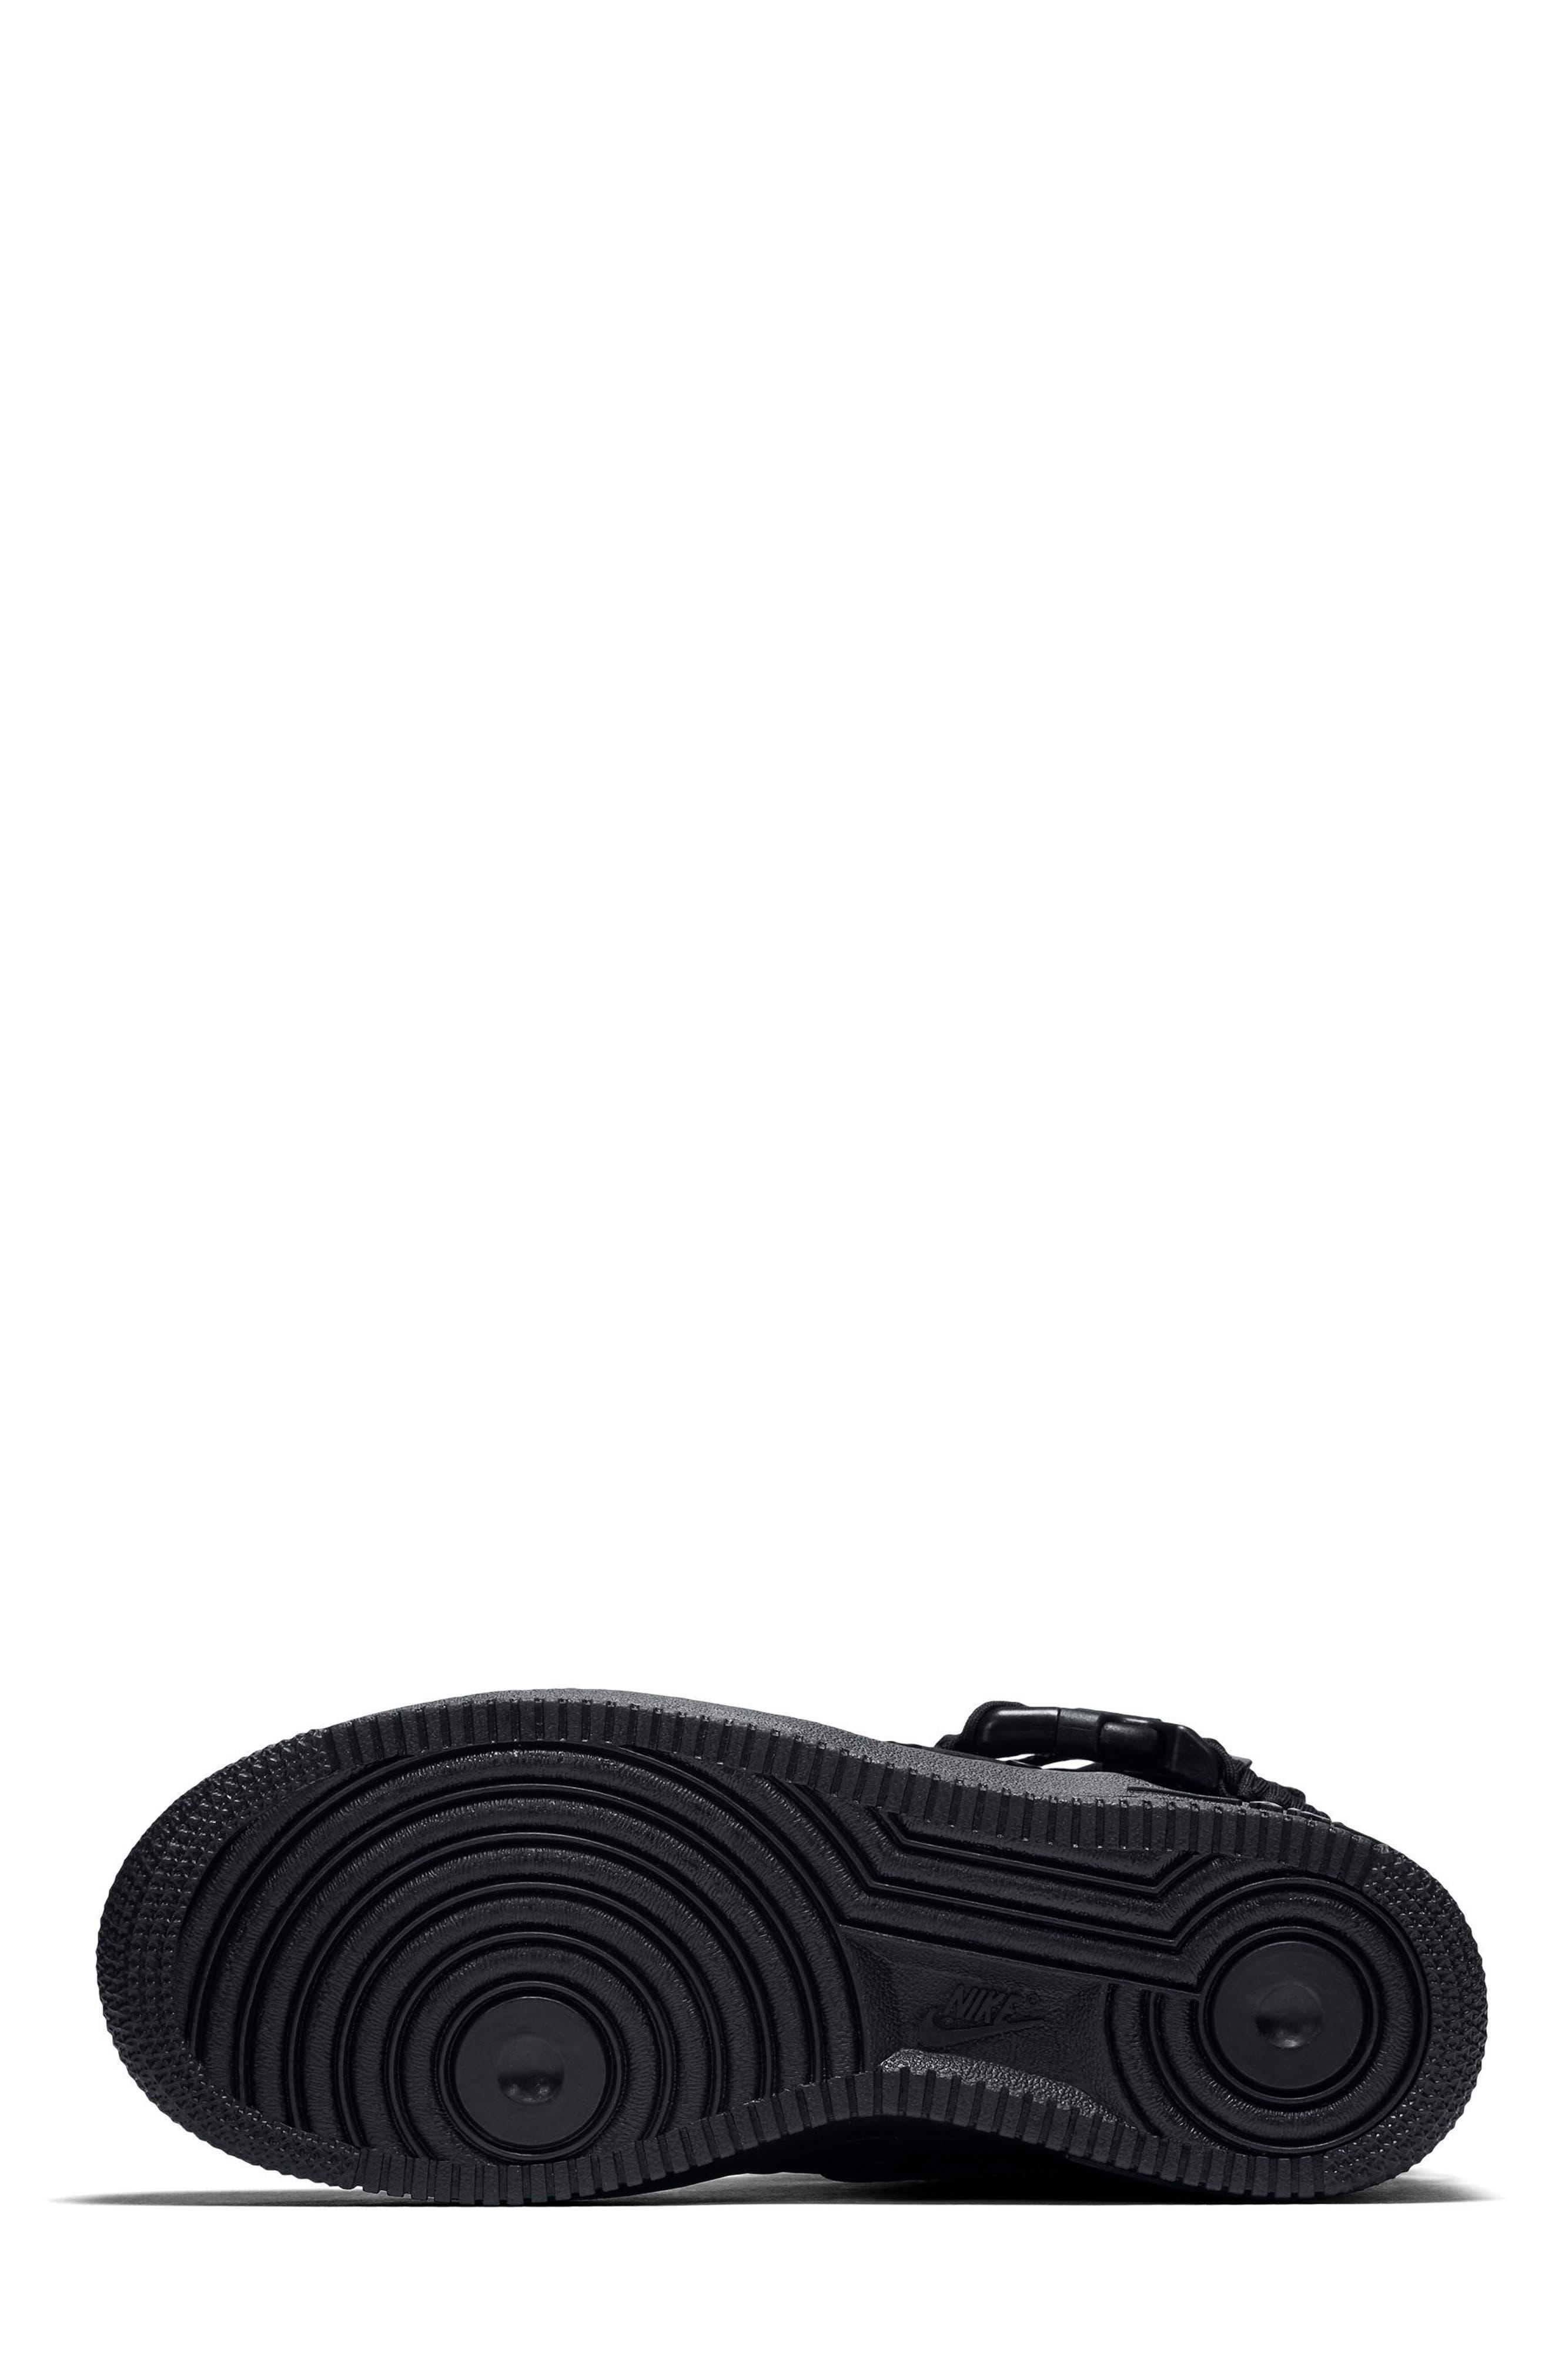 SF Air Force 1 High Top Sneaker,                             Alternate thumbnail 5, color,                             002